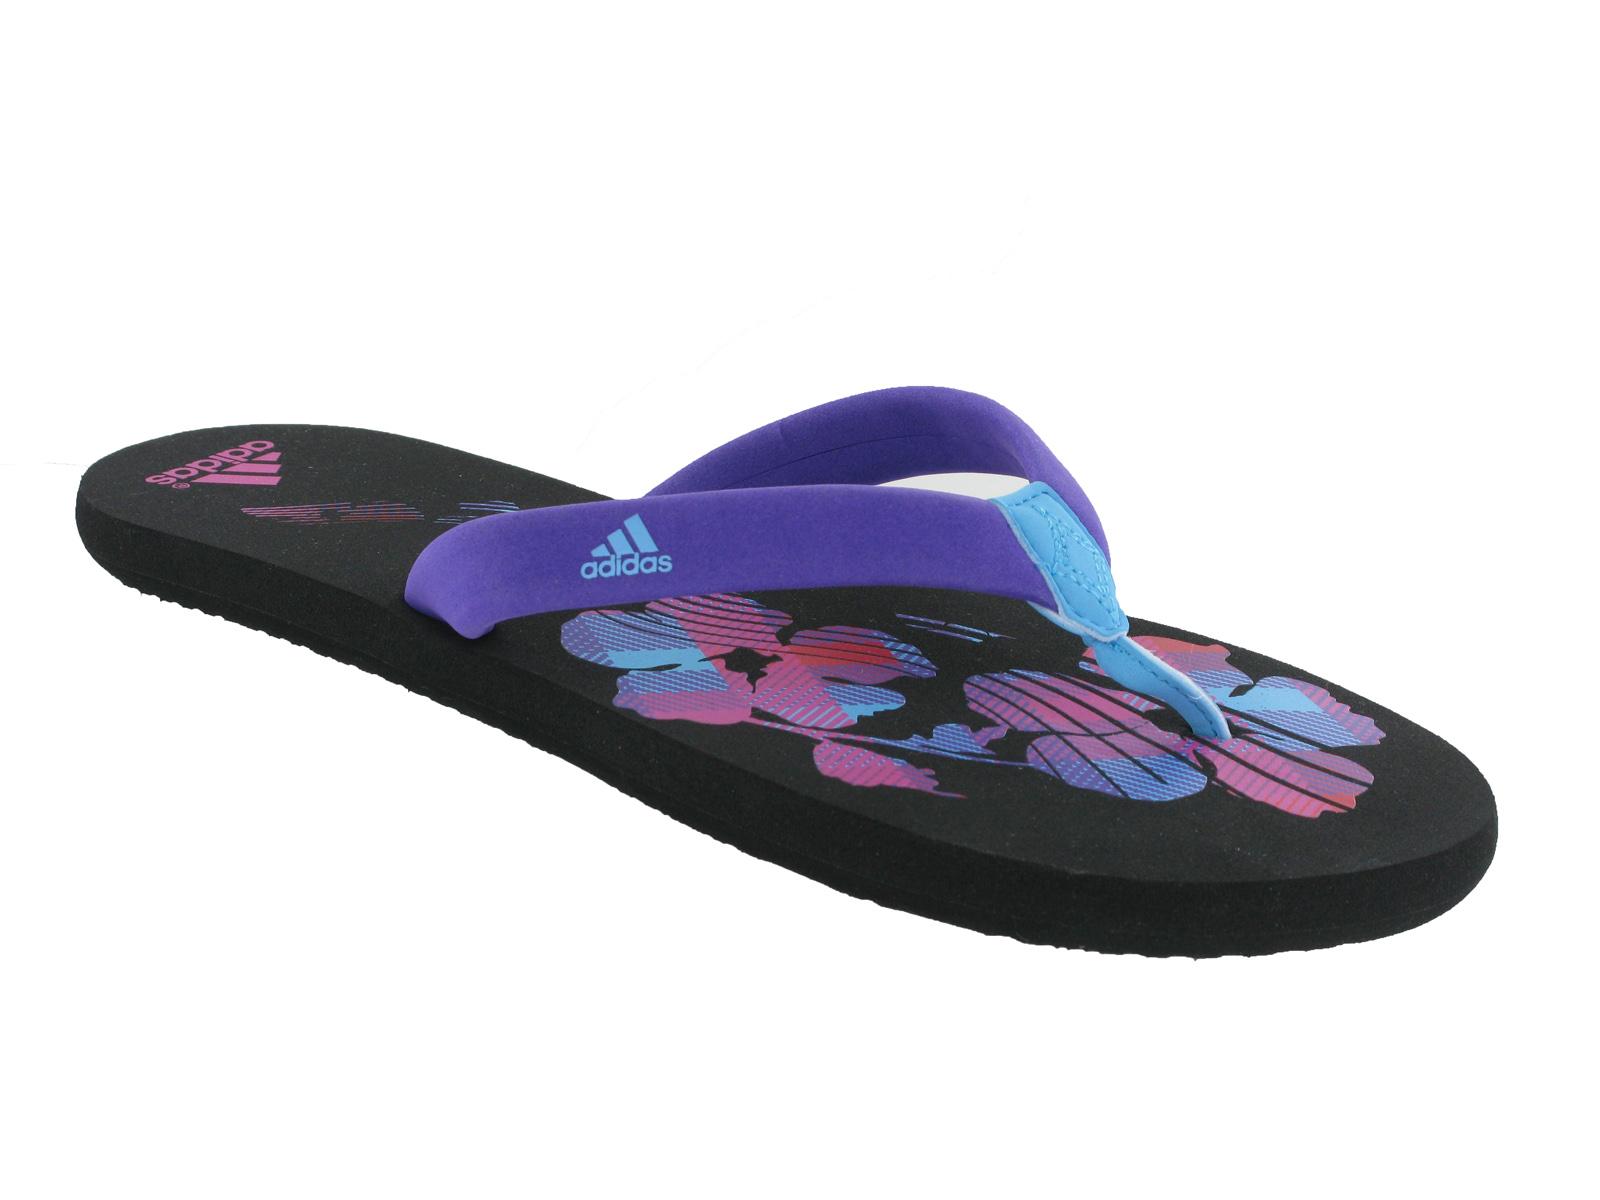 adidas flip flops uk ladies